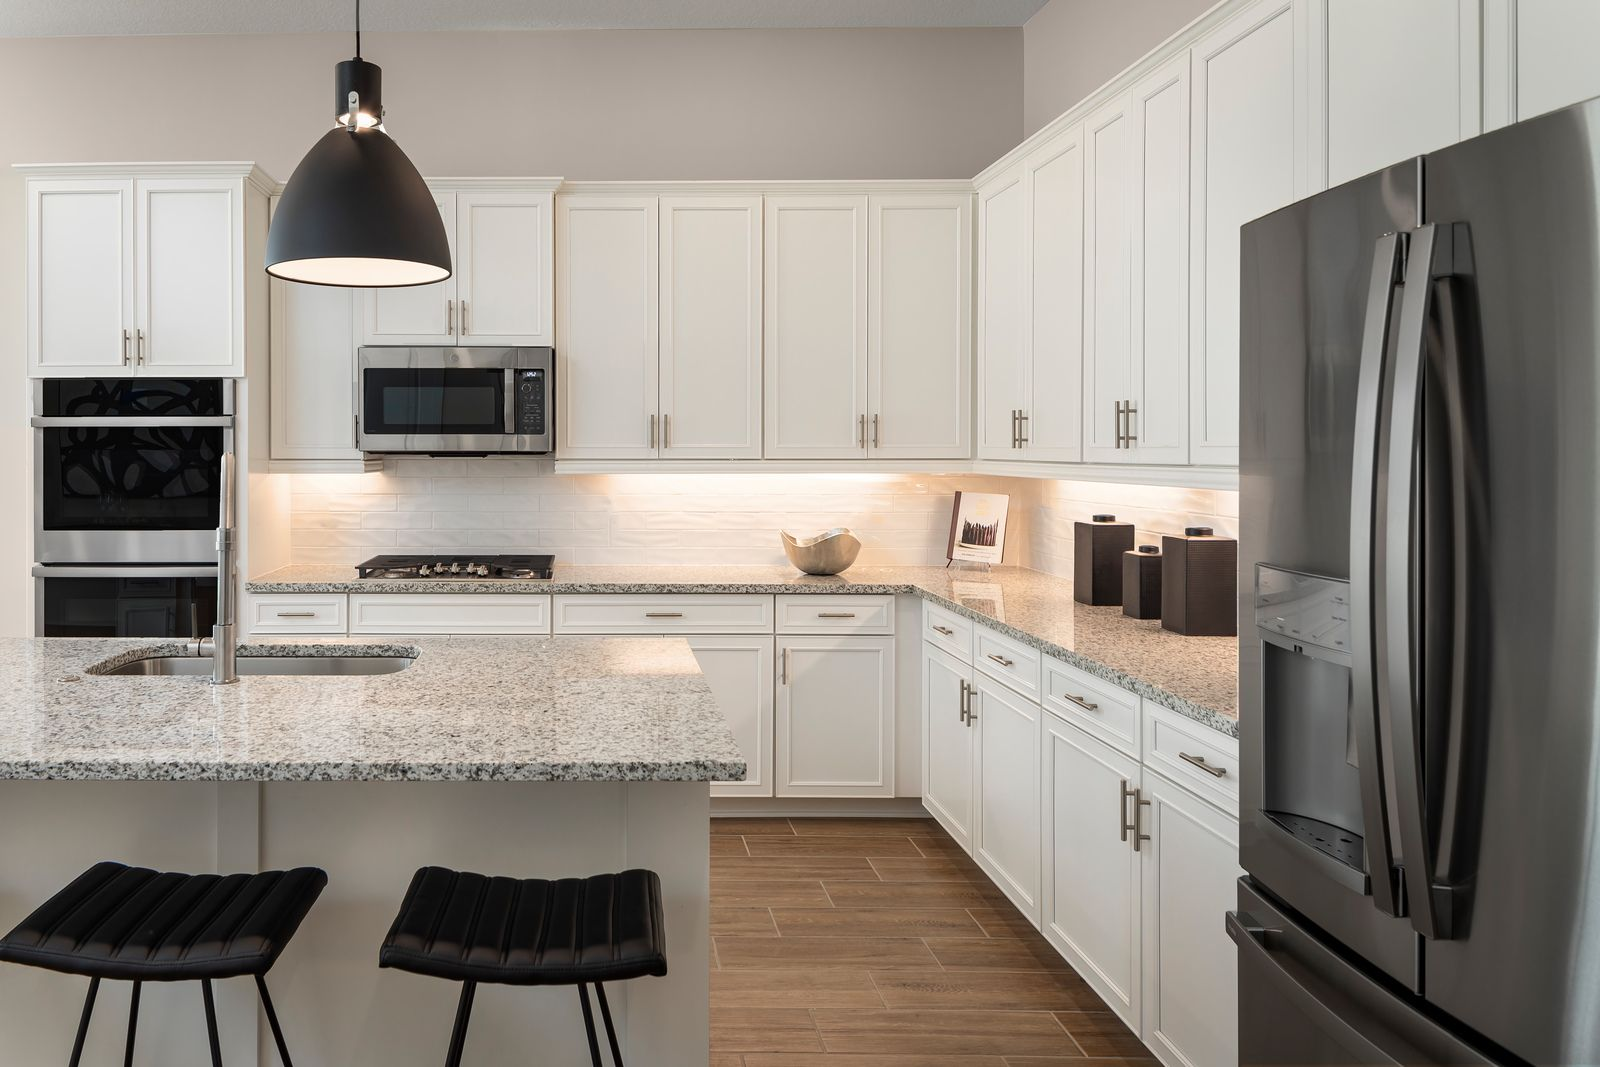 Kitchen featured in the St Marten Villas By Ryan Homes in Broward County-Ft. Lauderdale, FL